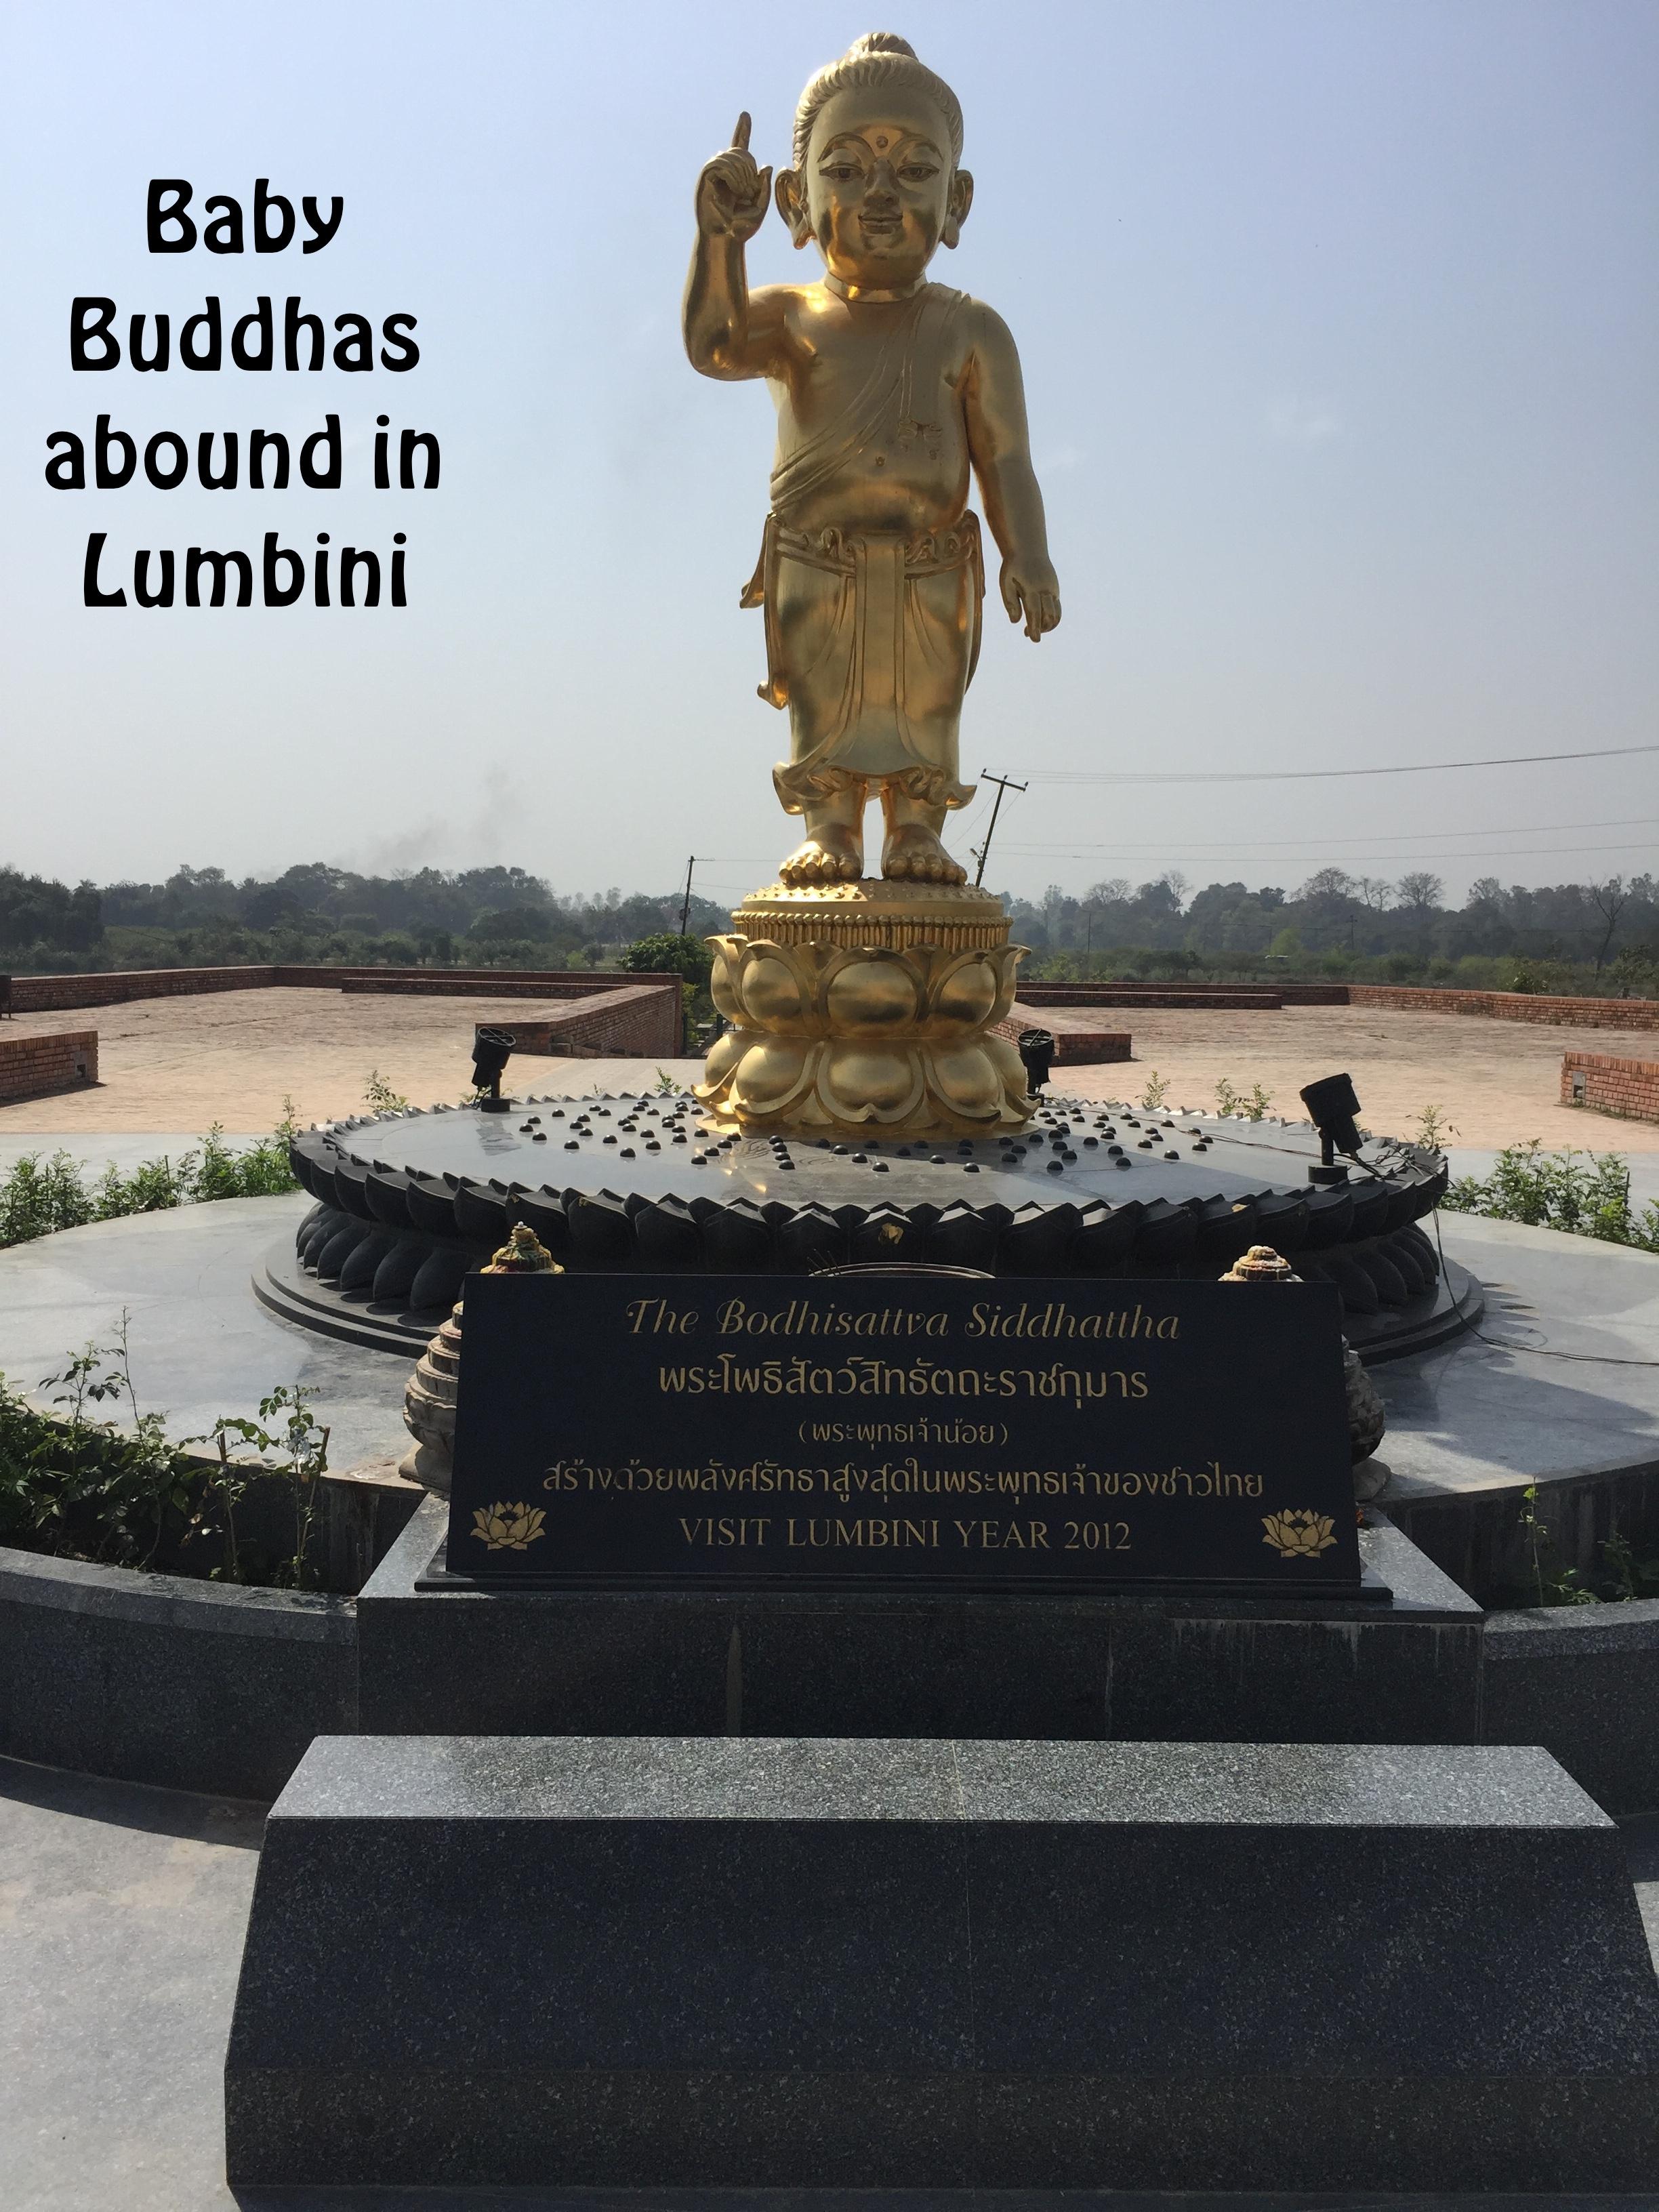 Baby Buddha in Lumbini